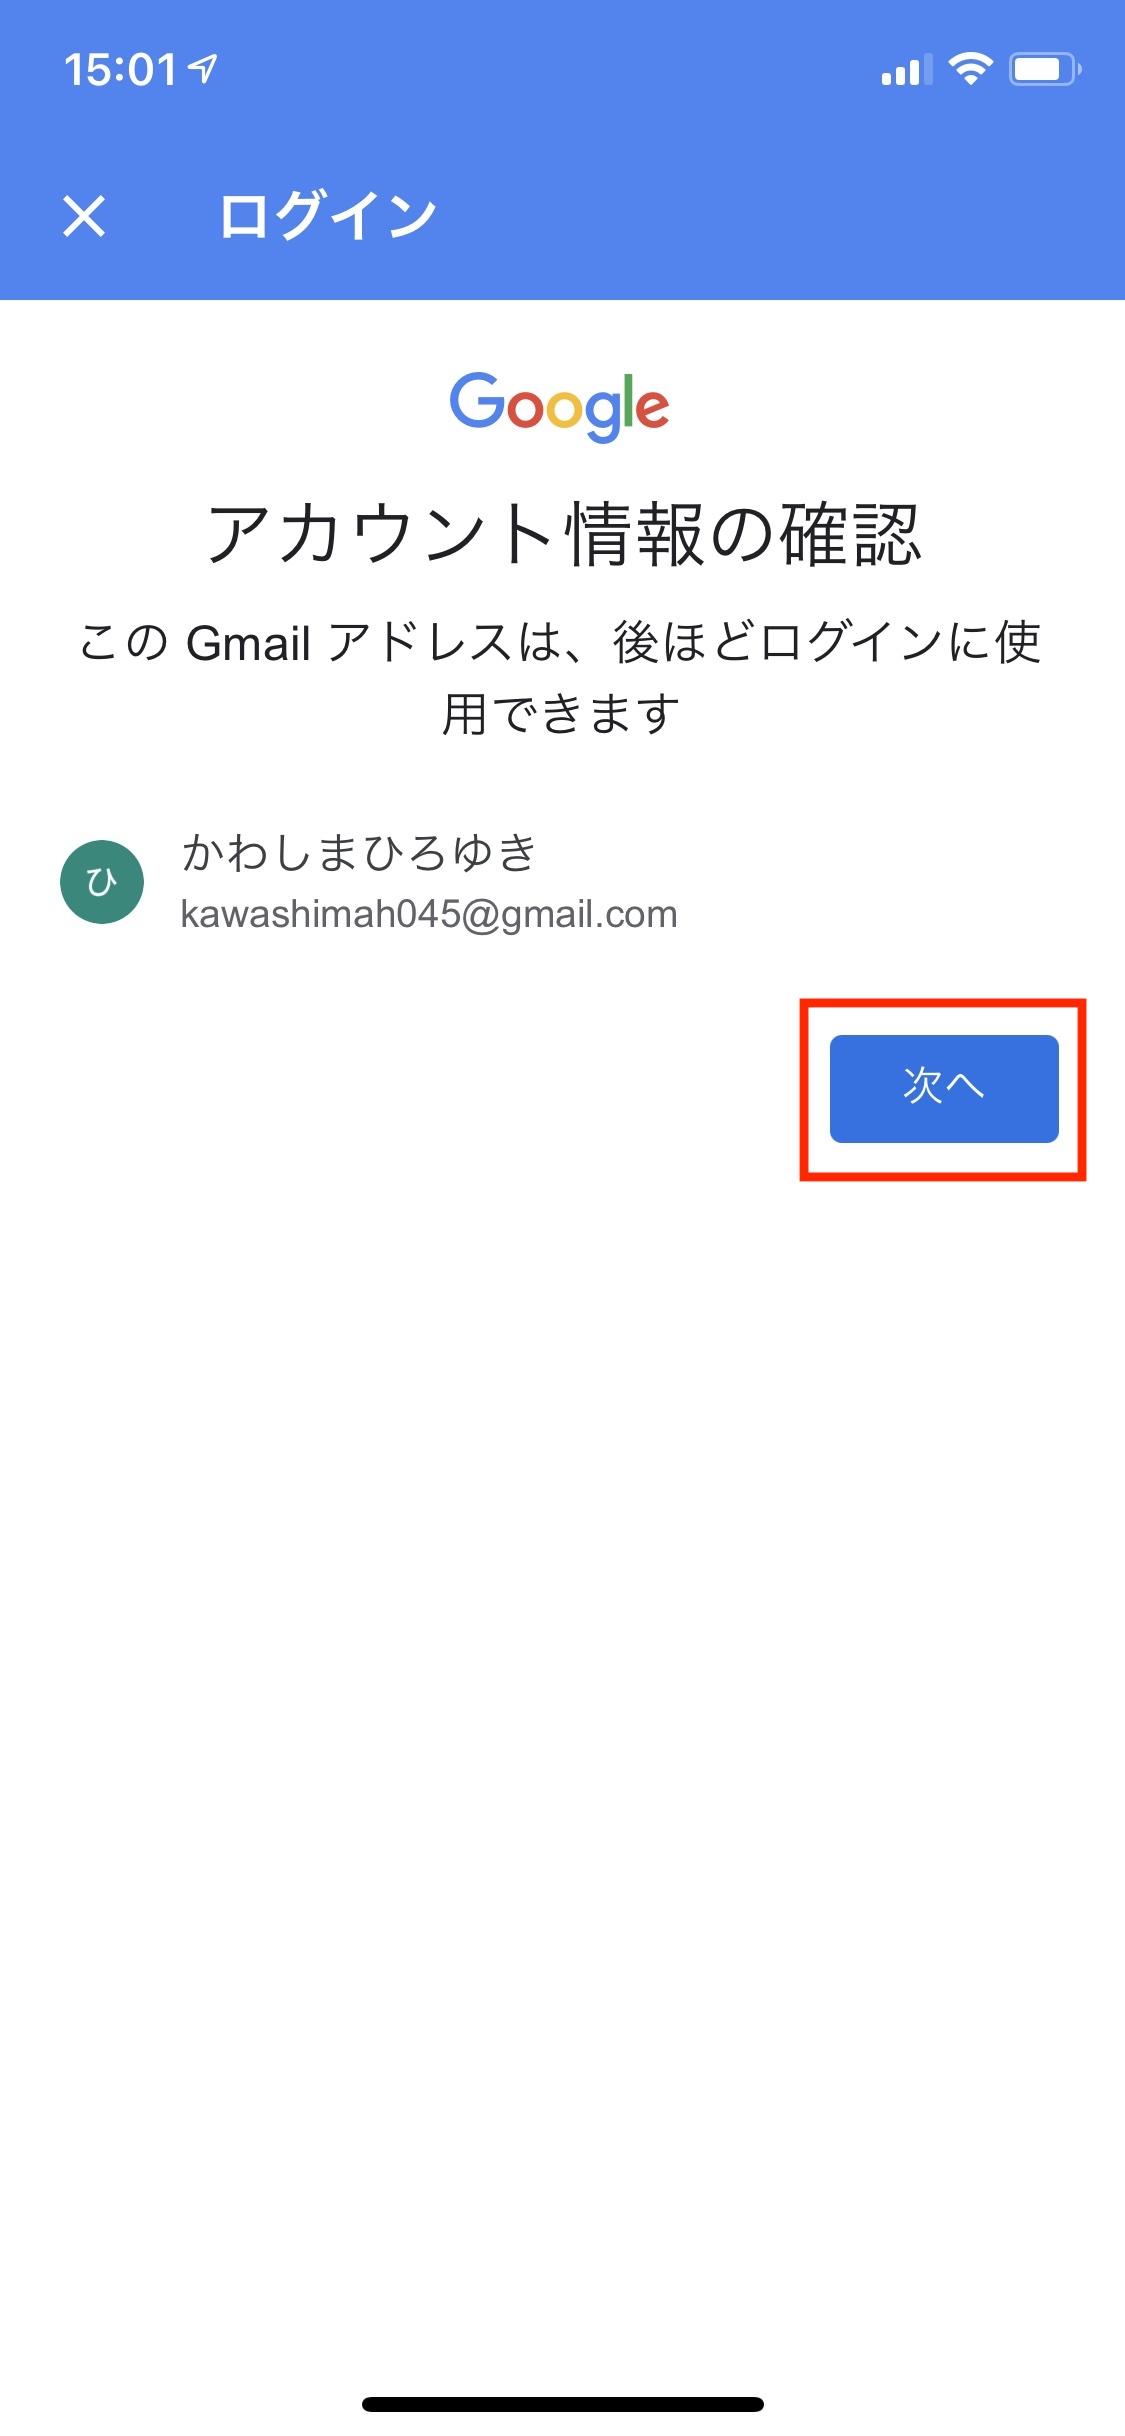 Google Chromeのアカウント情報の確認画面